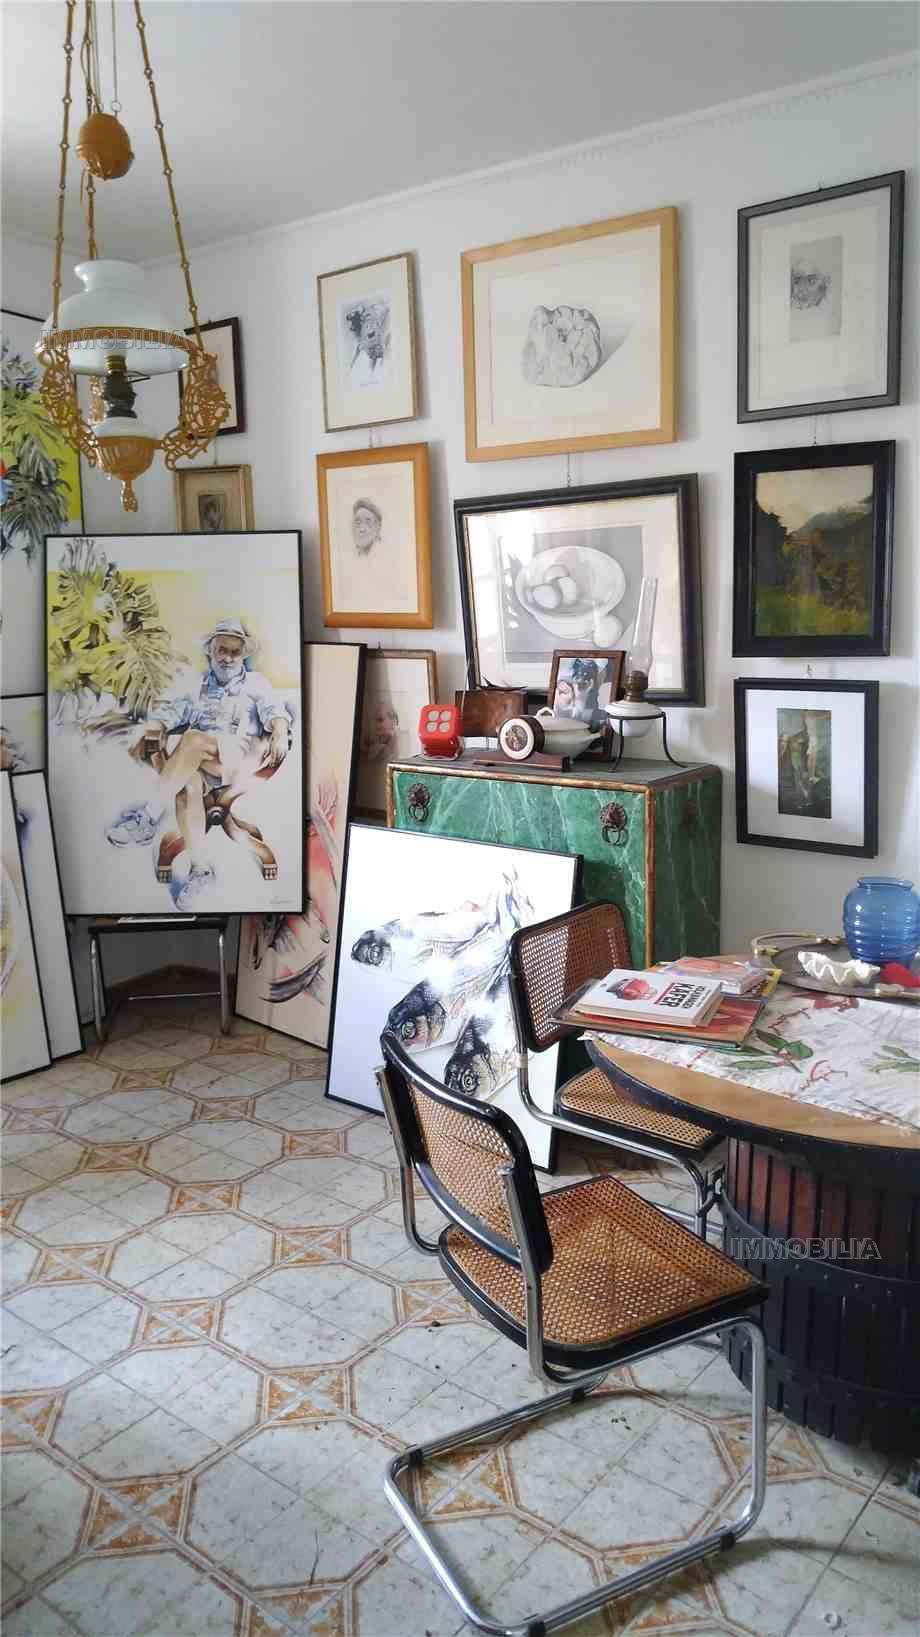 Venta Casa adosada Sansepolcro  #459 n.7